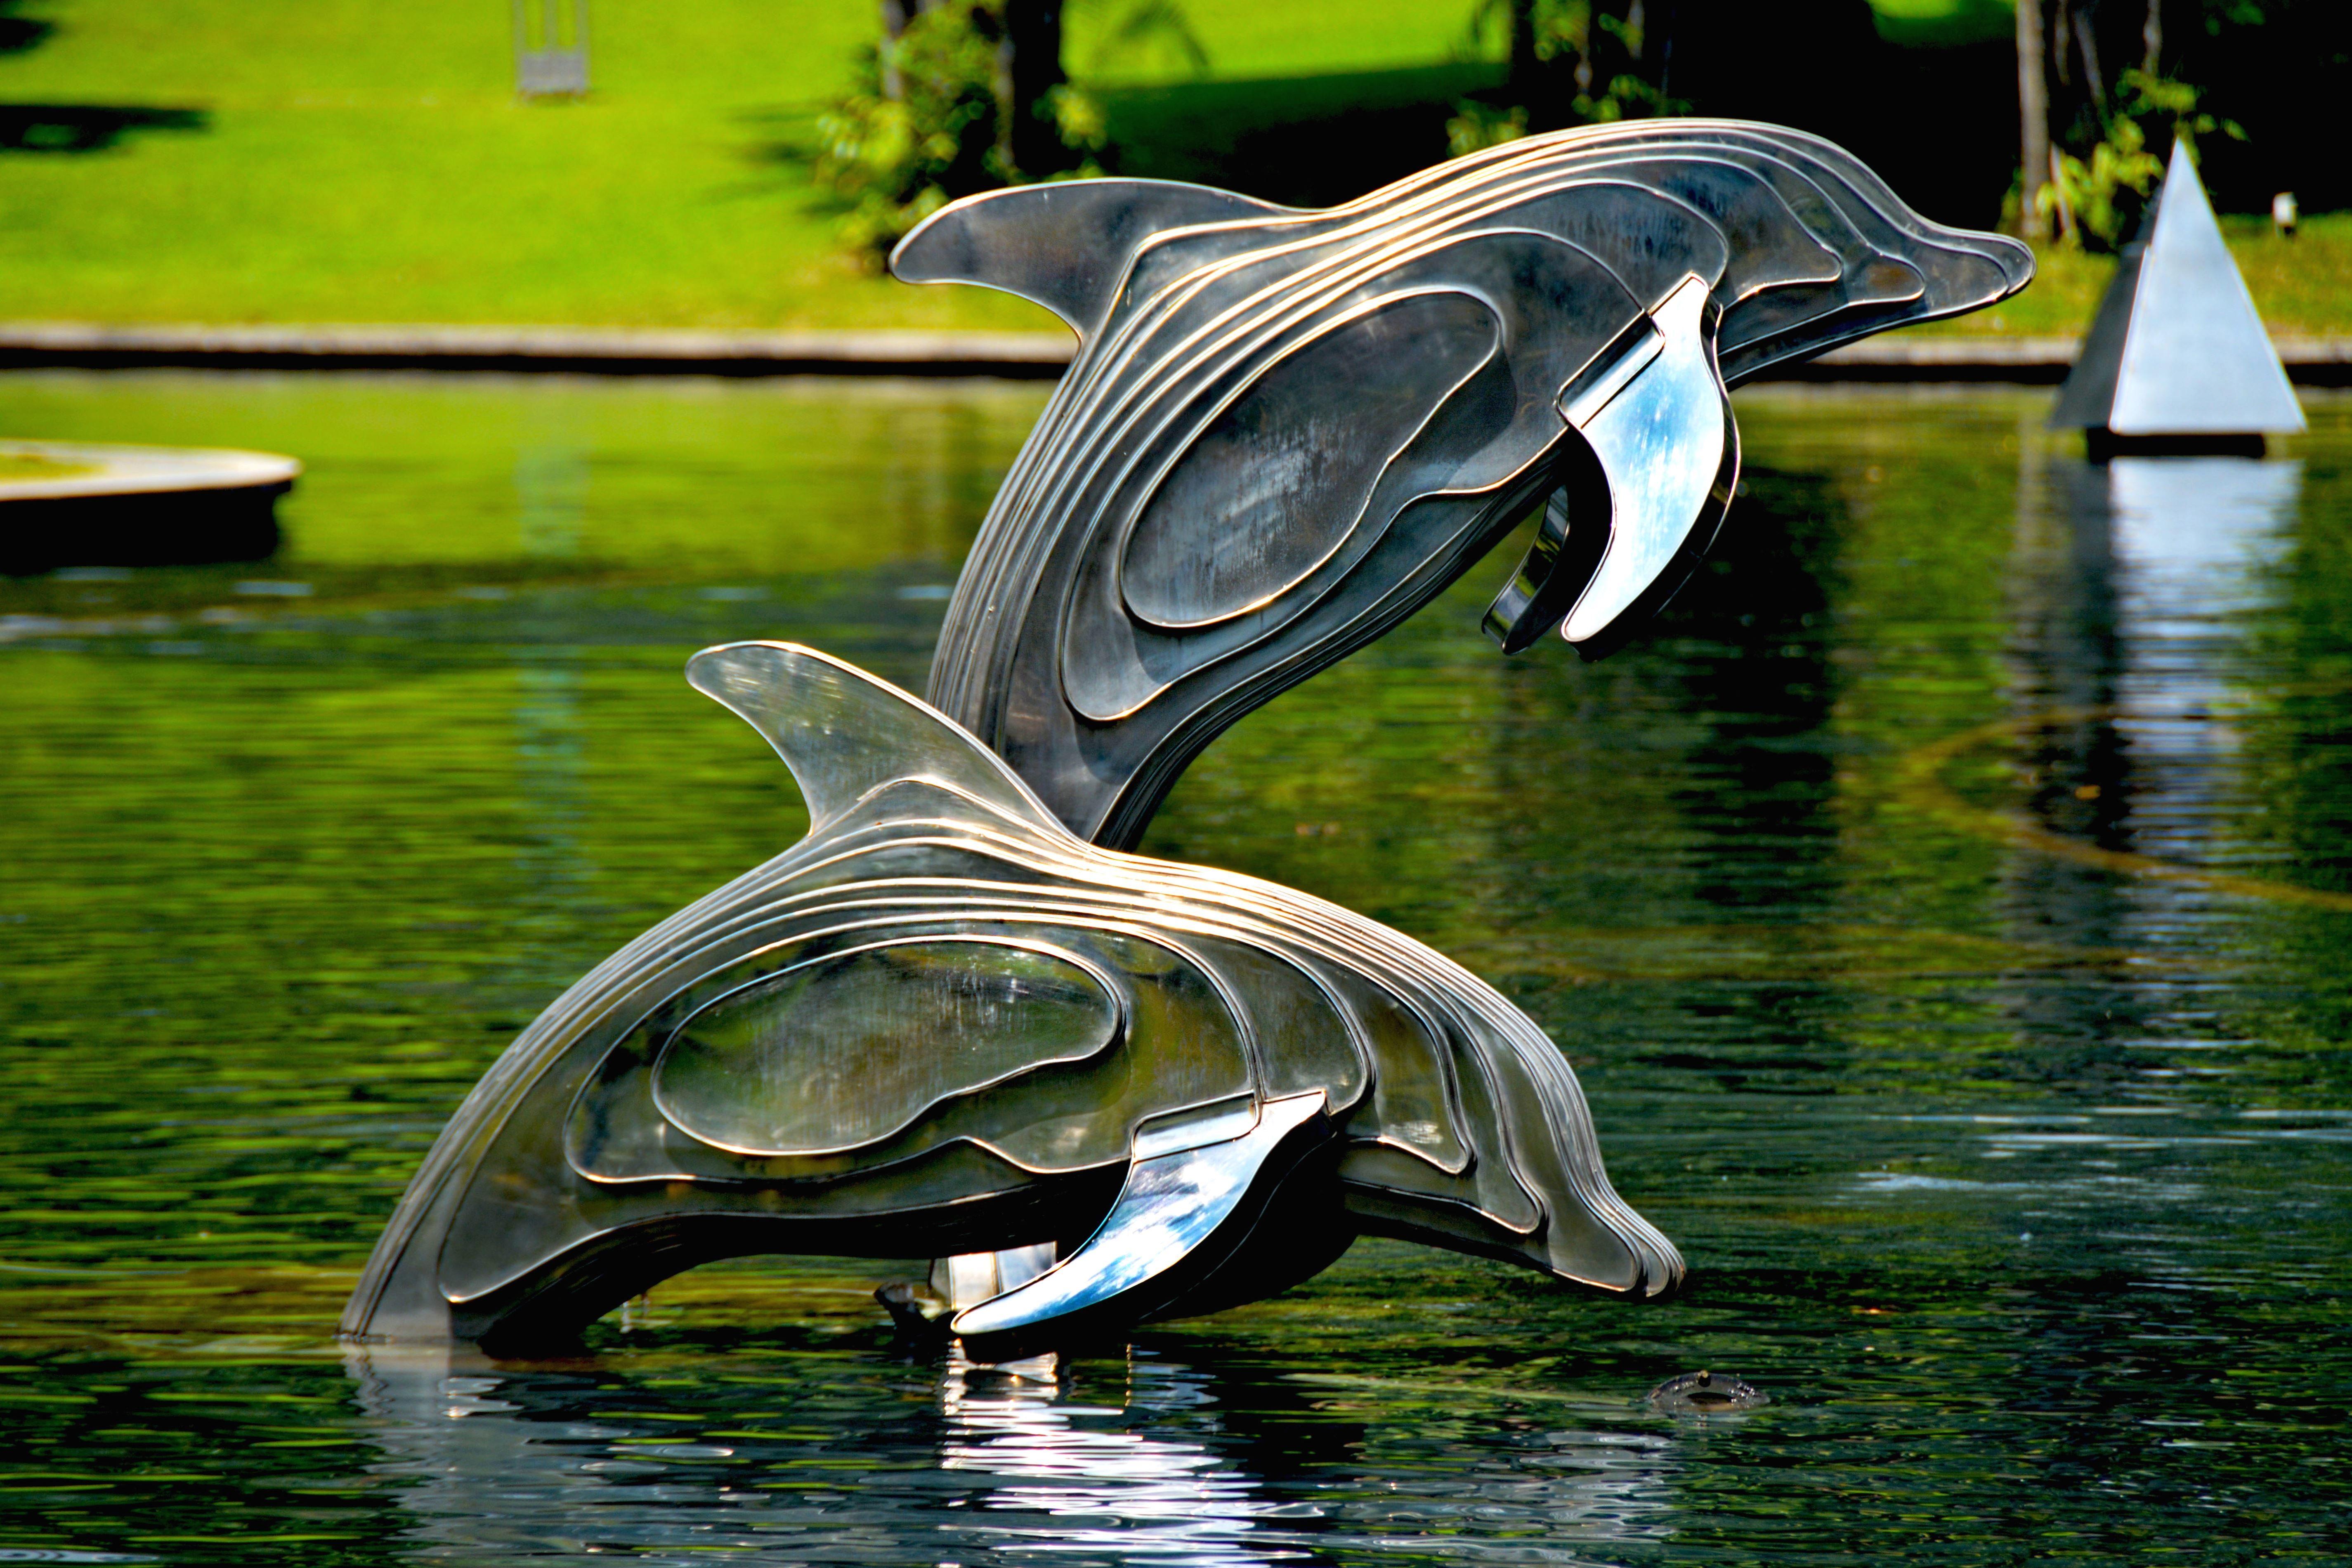 Image libre Animaux sculpture aquatique architecture dauphins poissons jardin